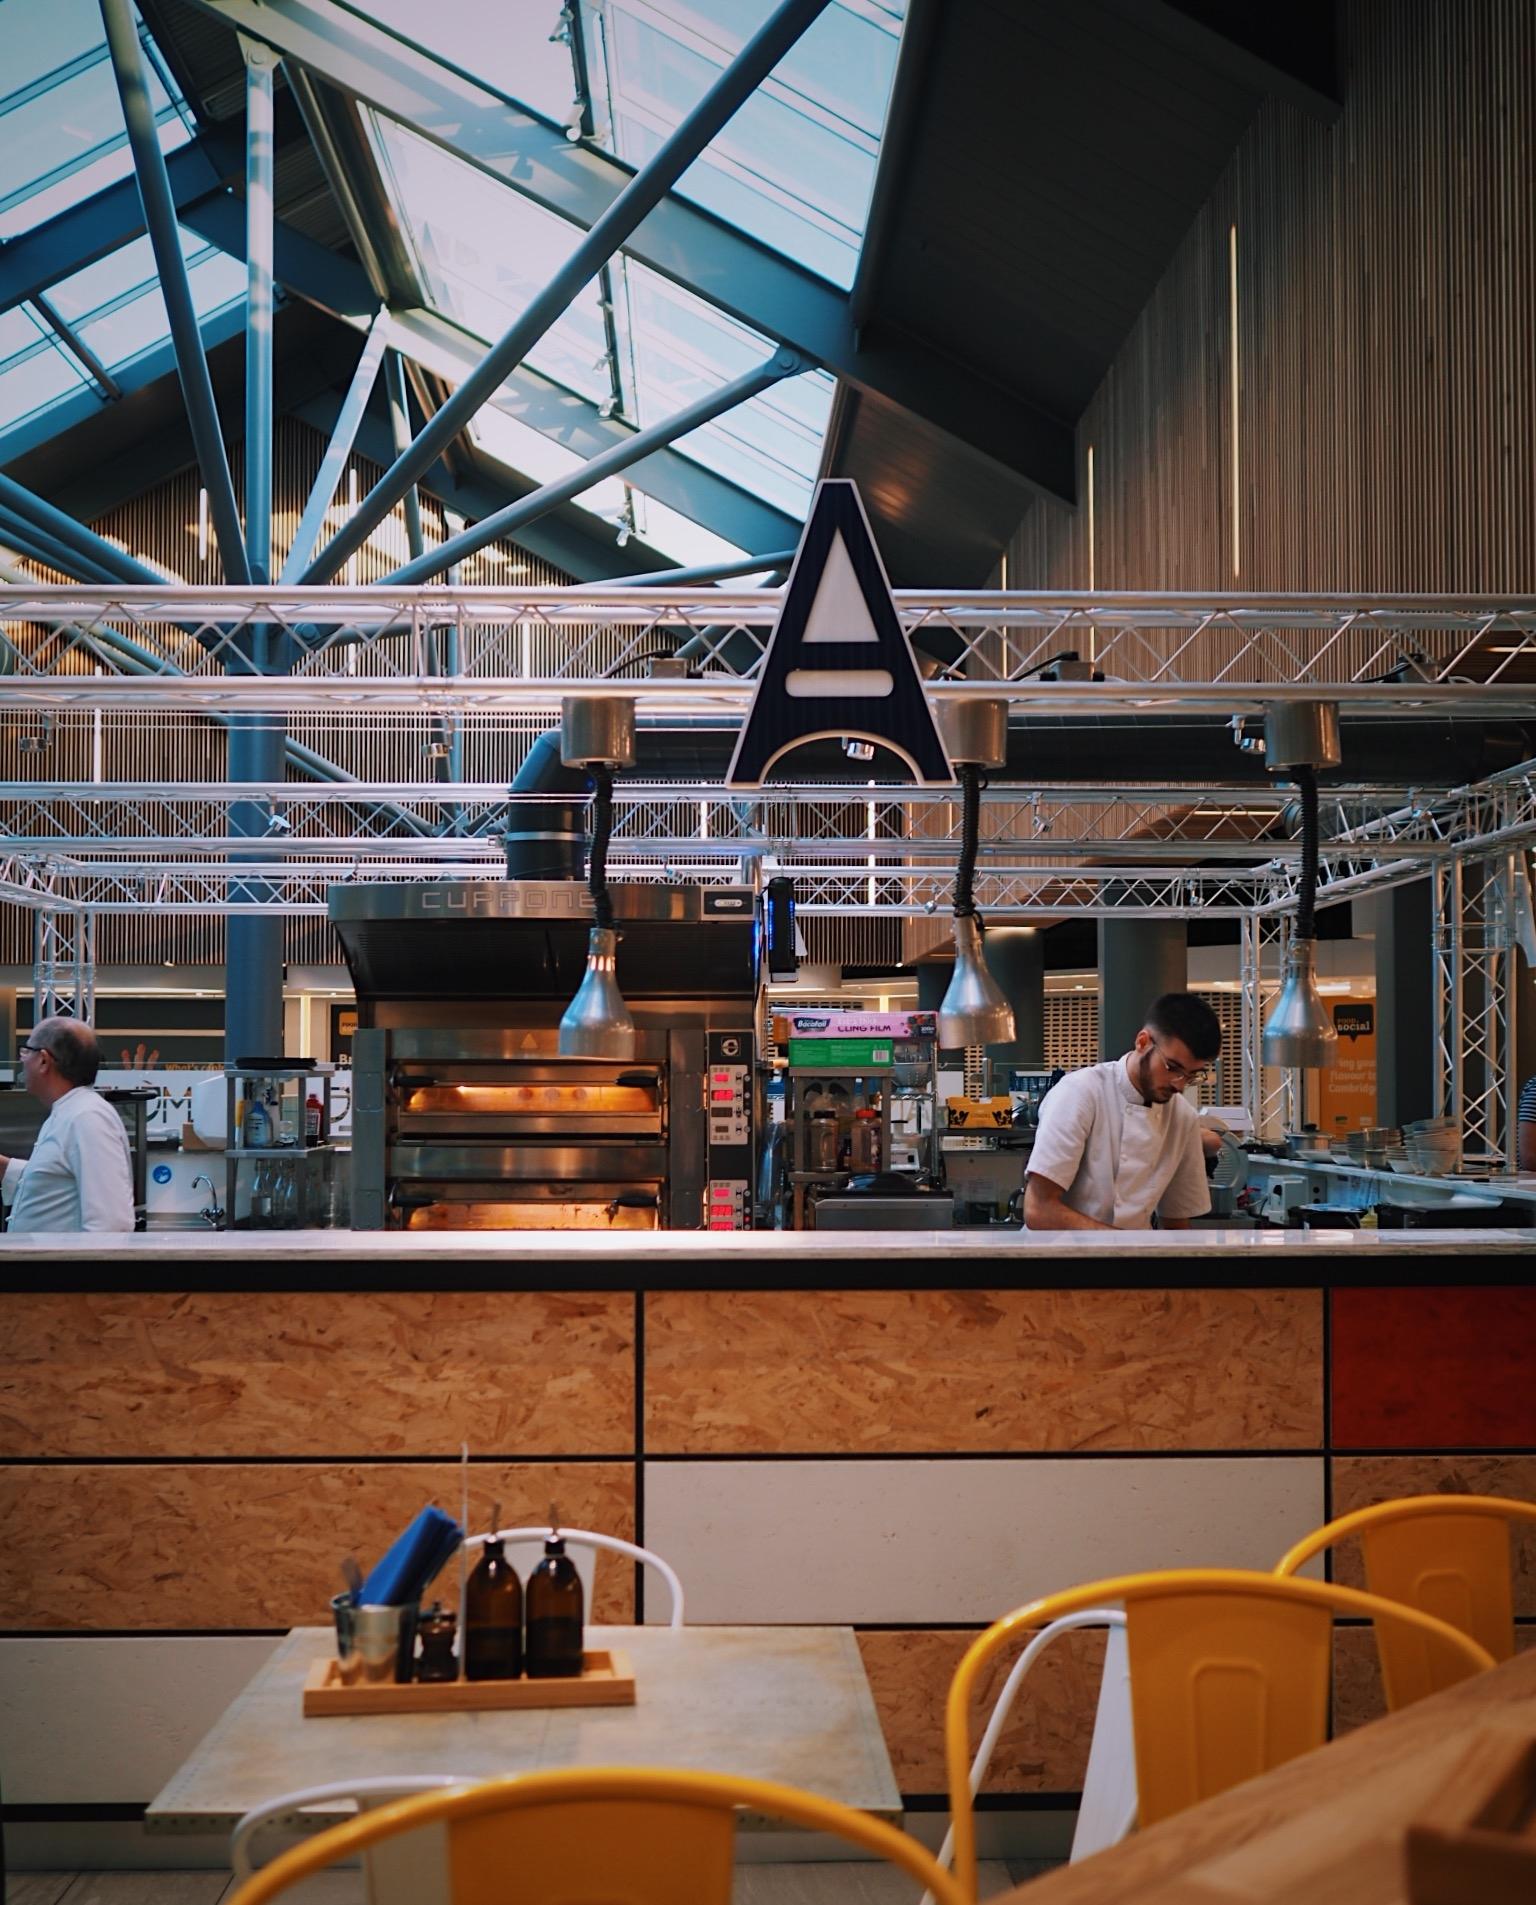 The open kitchen at Amelie Restaurant